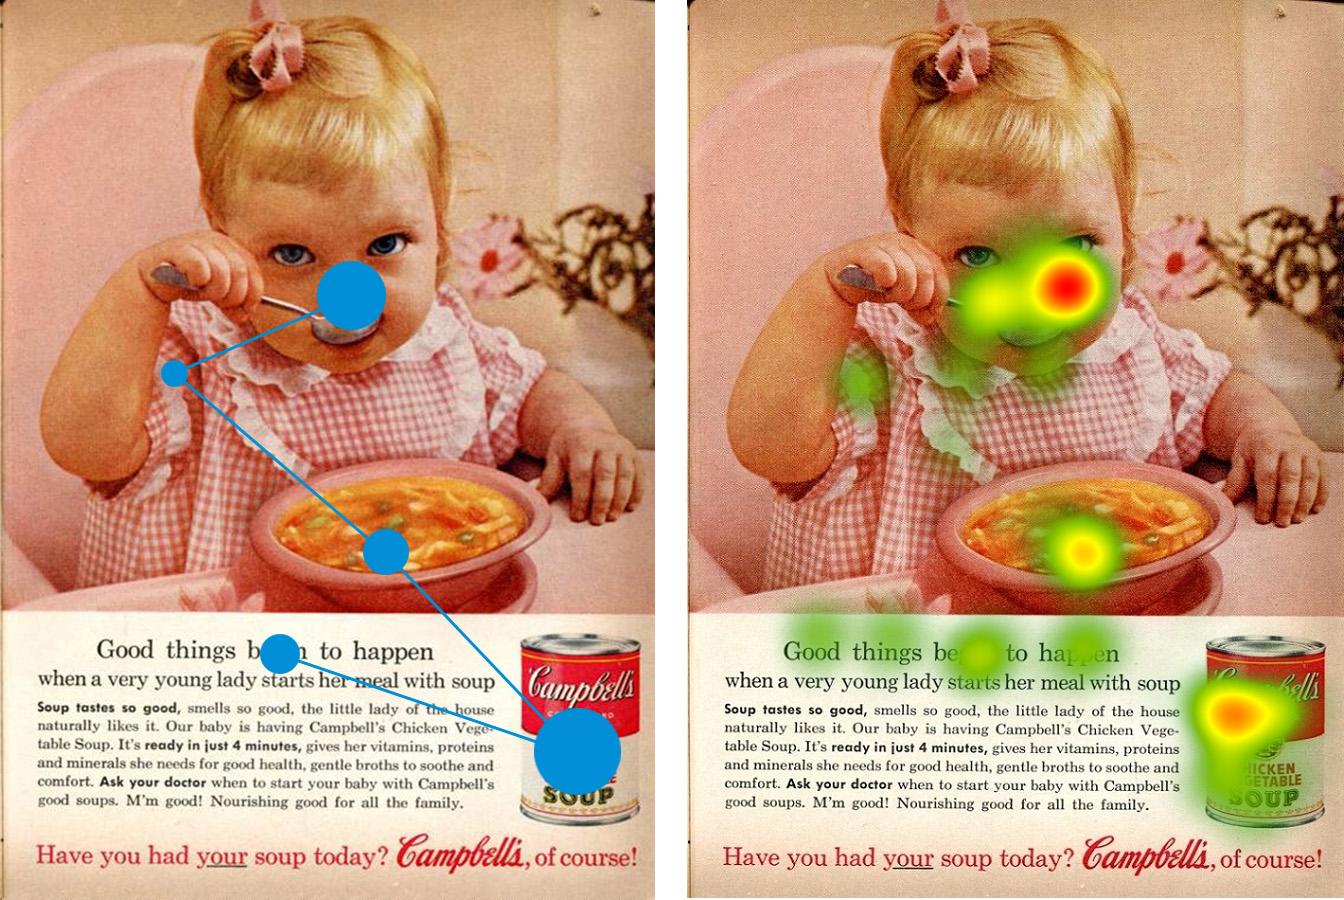 visual copy test